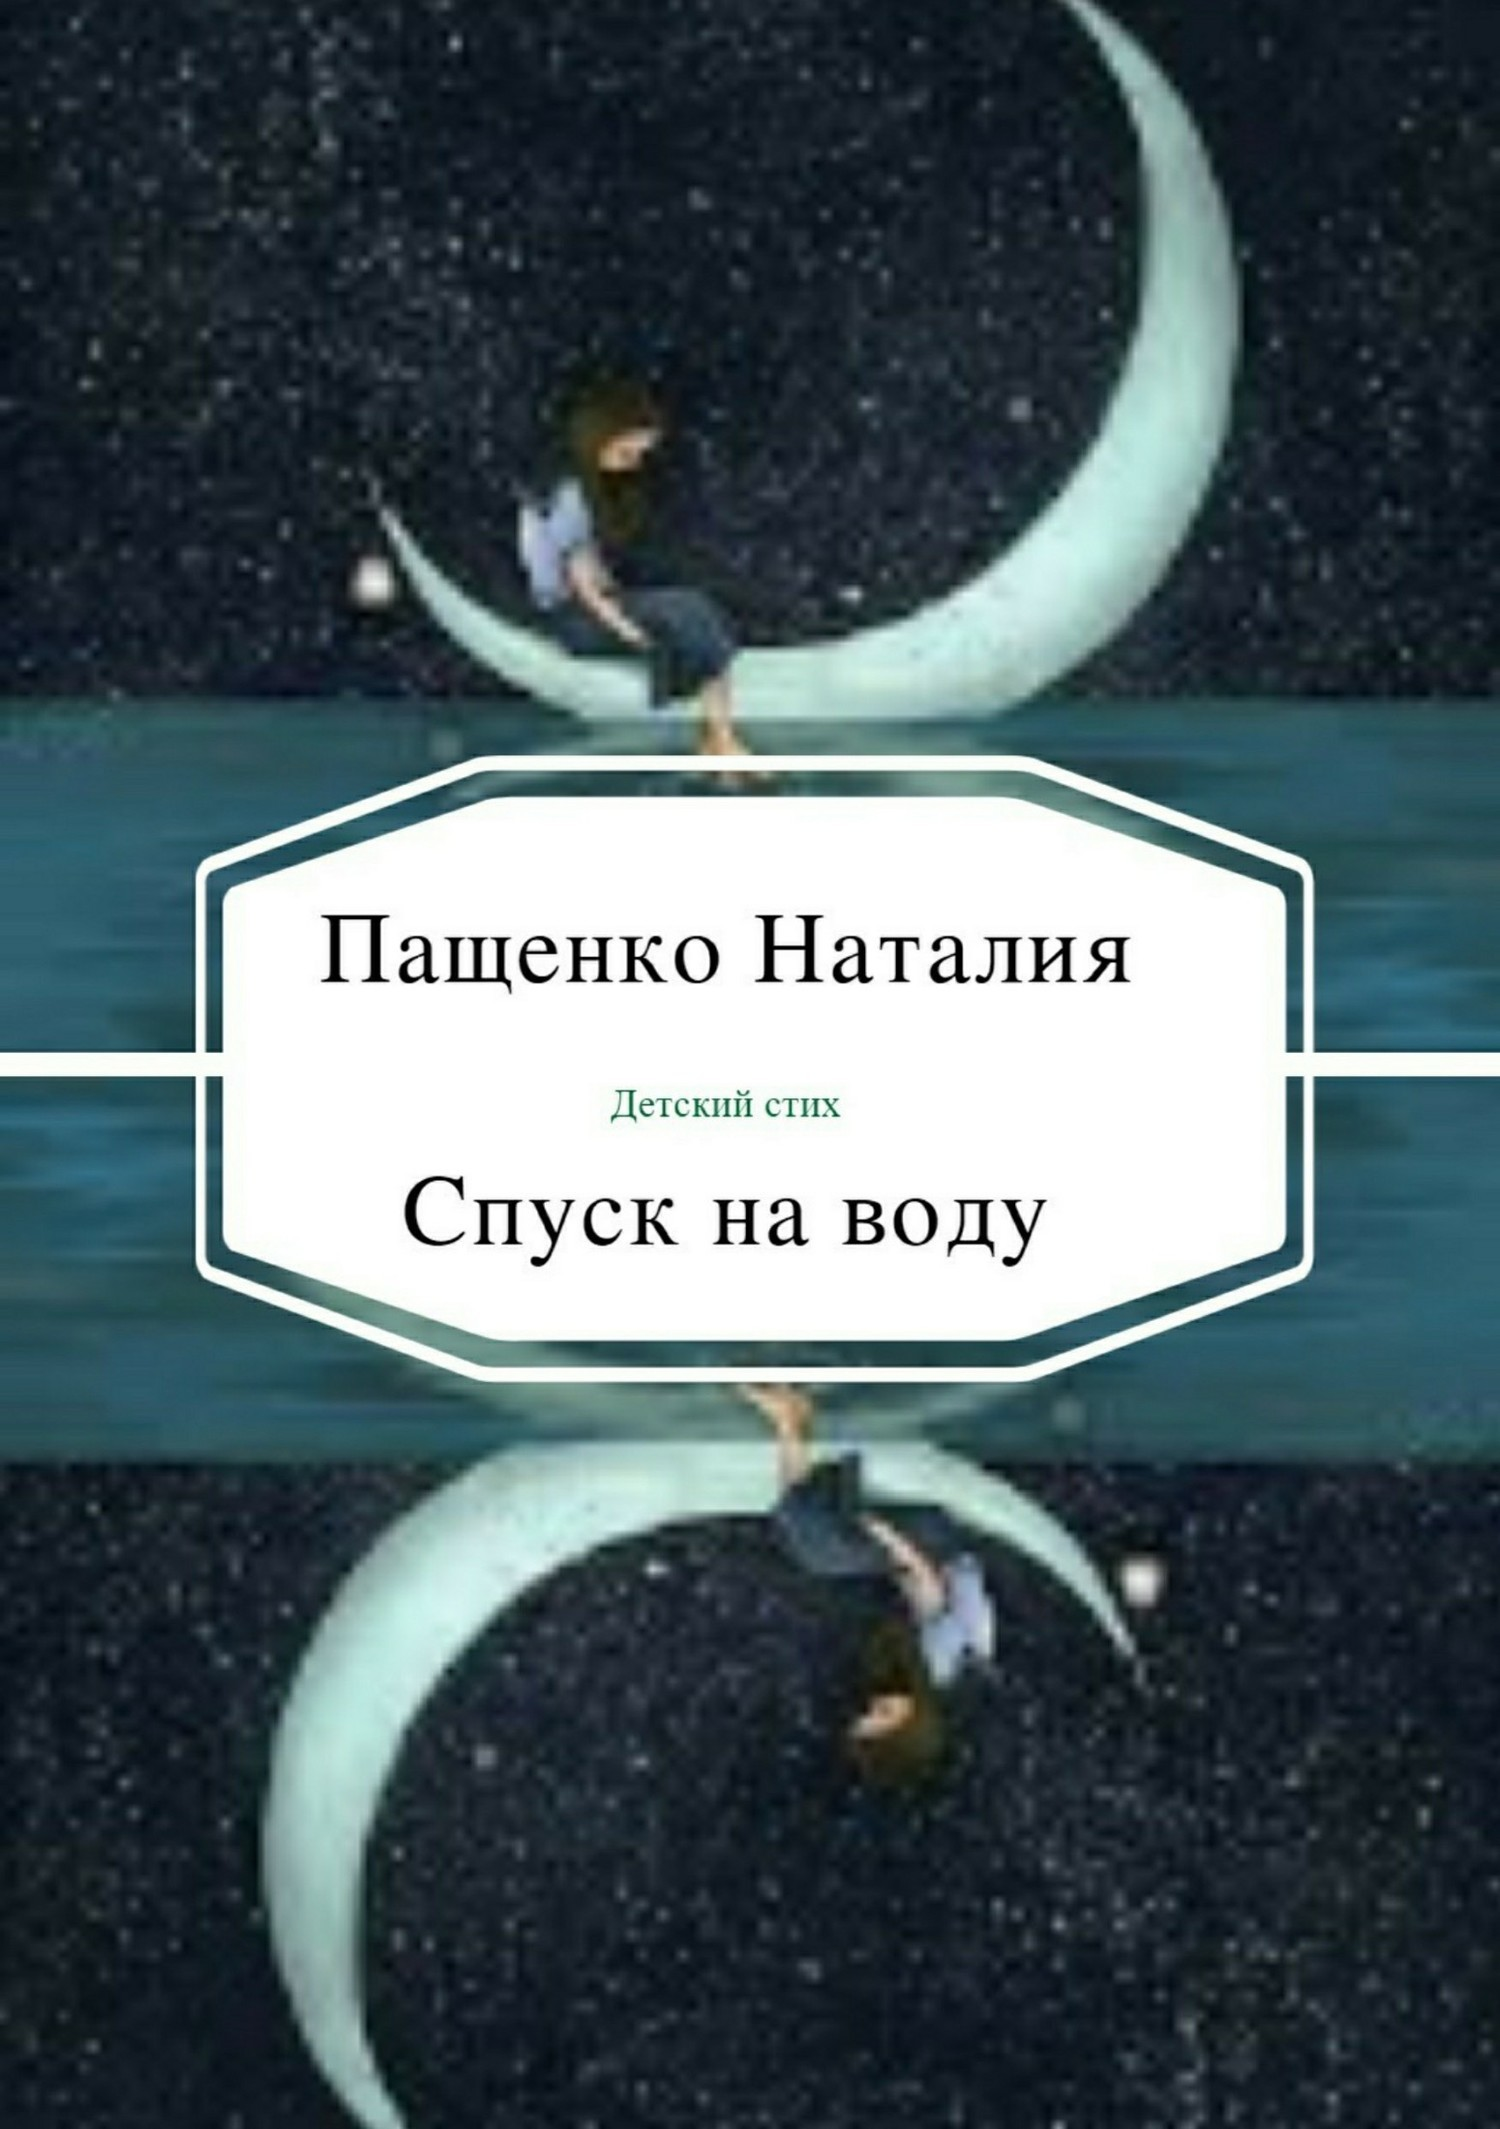 Наталия Пащенко - Спуск на воду